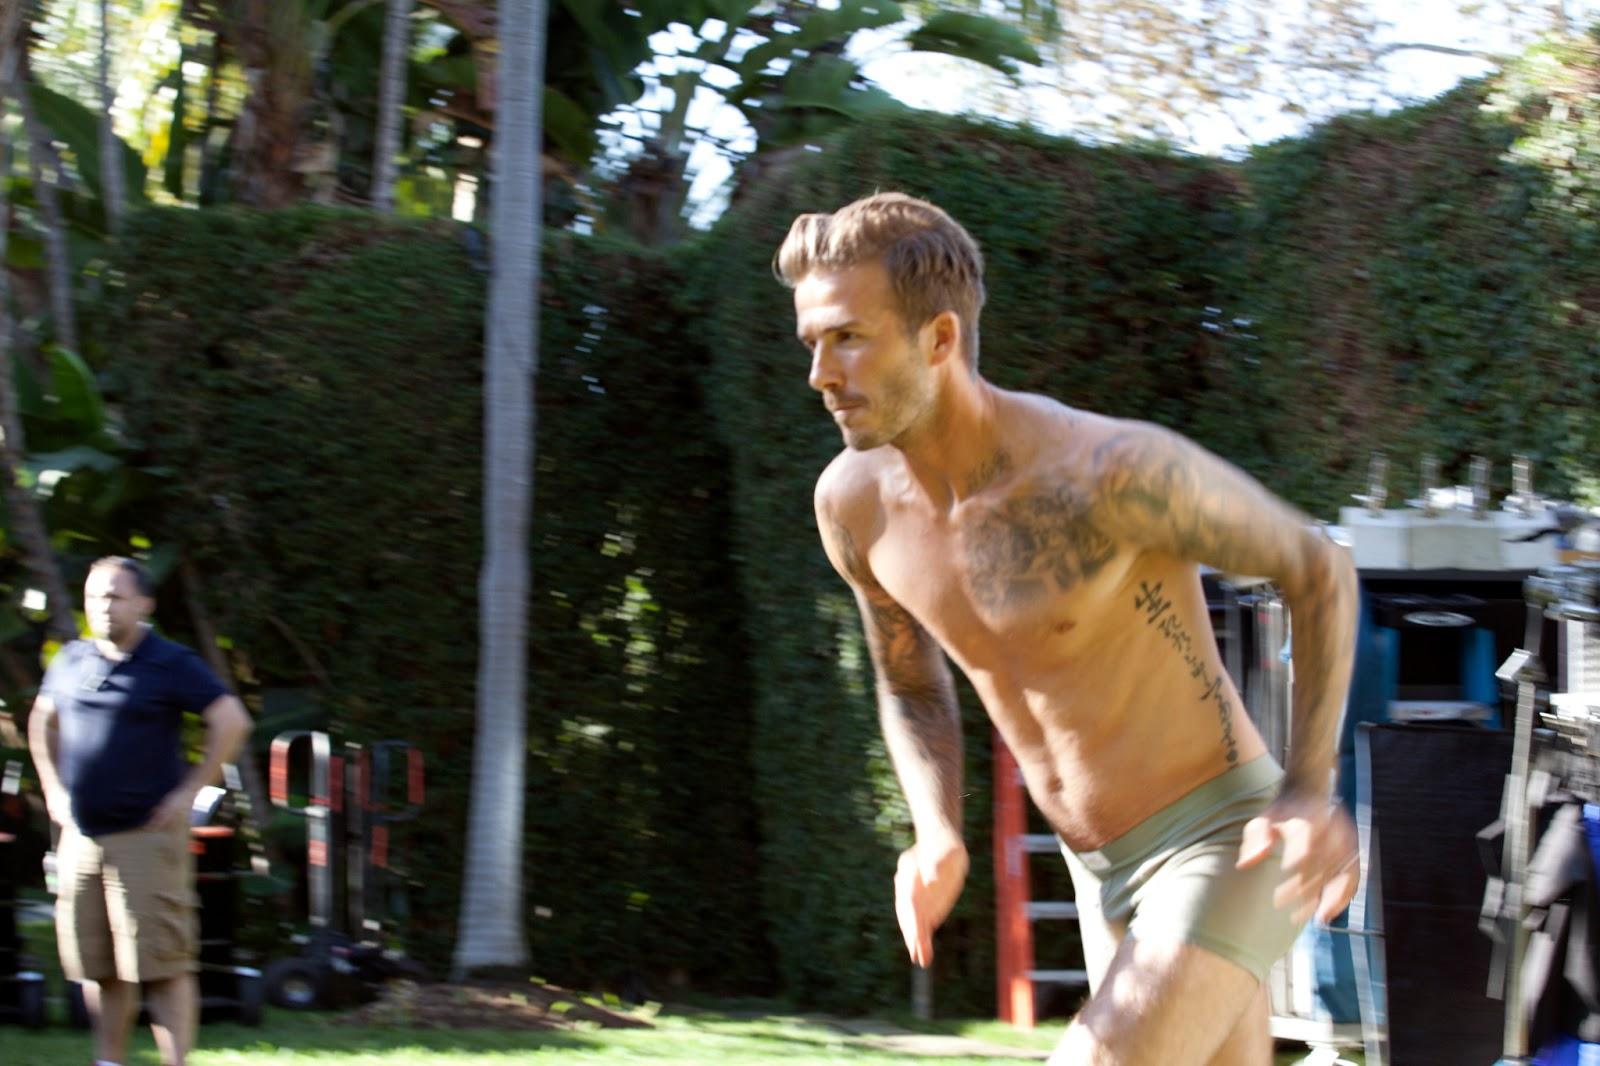 http://2.bp.blogspot.com/--nKJznMWLnE/UPLquBUyr5I/AAAAAAAARt8/Lzjre_zXVcY/s1600/David+Beckham+naked+underwear+bodywear+H%2526M+Guy+Ritchie.jpg